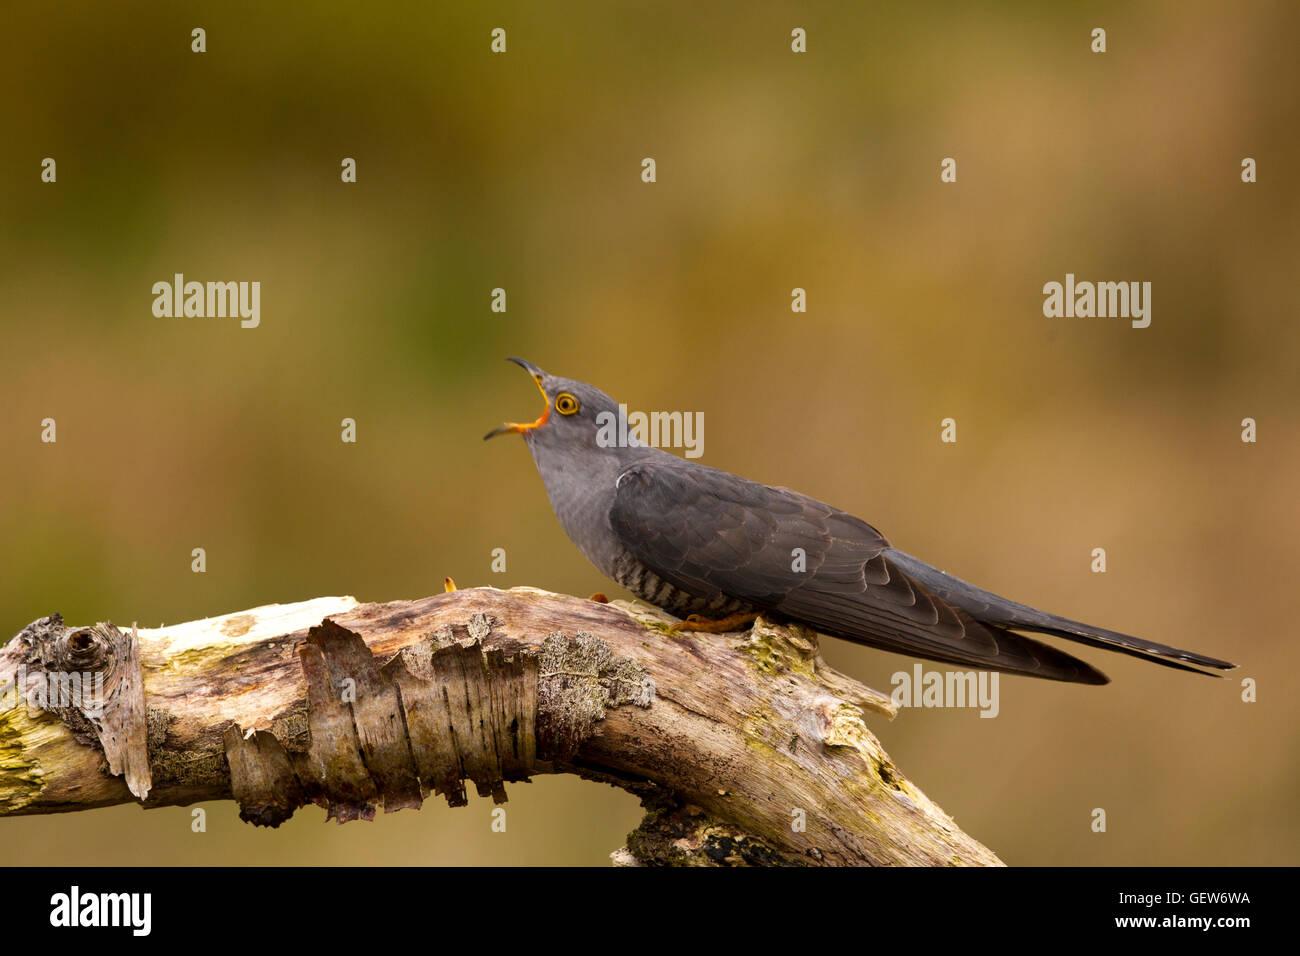 Cuckoo Calling - Stock Image